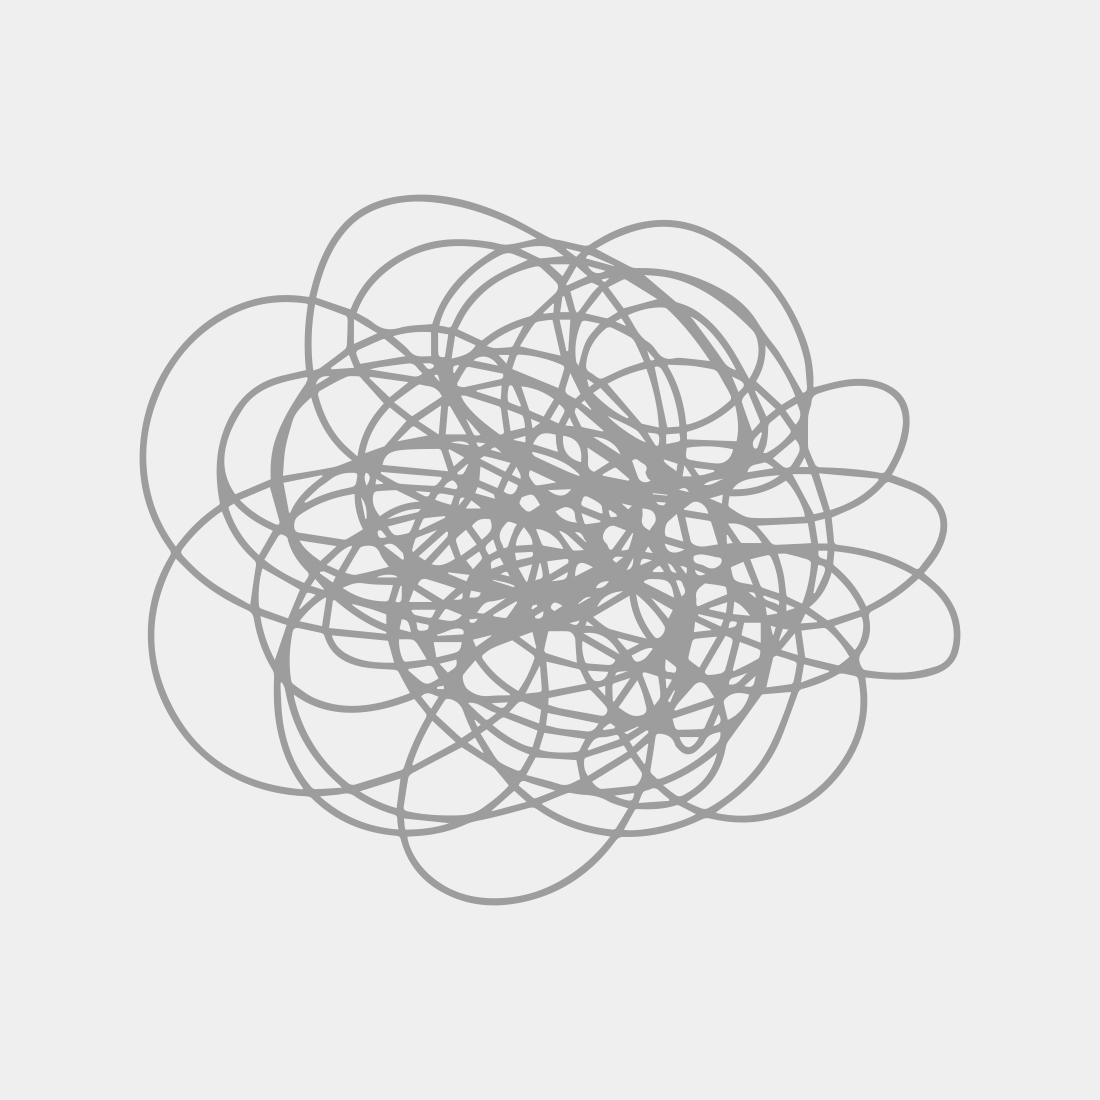 Collections Gallery Postcard Sir Joshua Reynolds PRA (1723-92) Self-Portrait, C. 1780